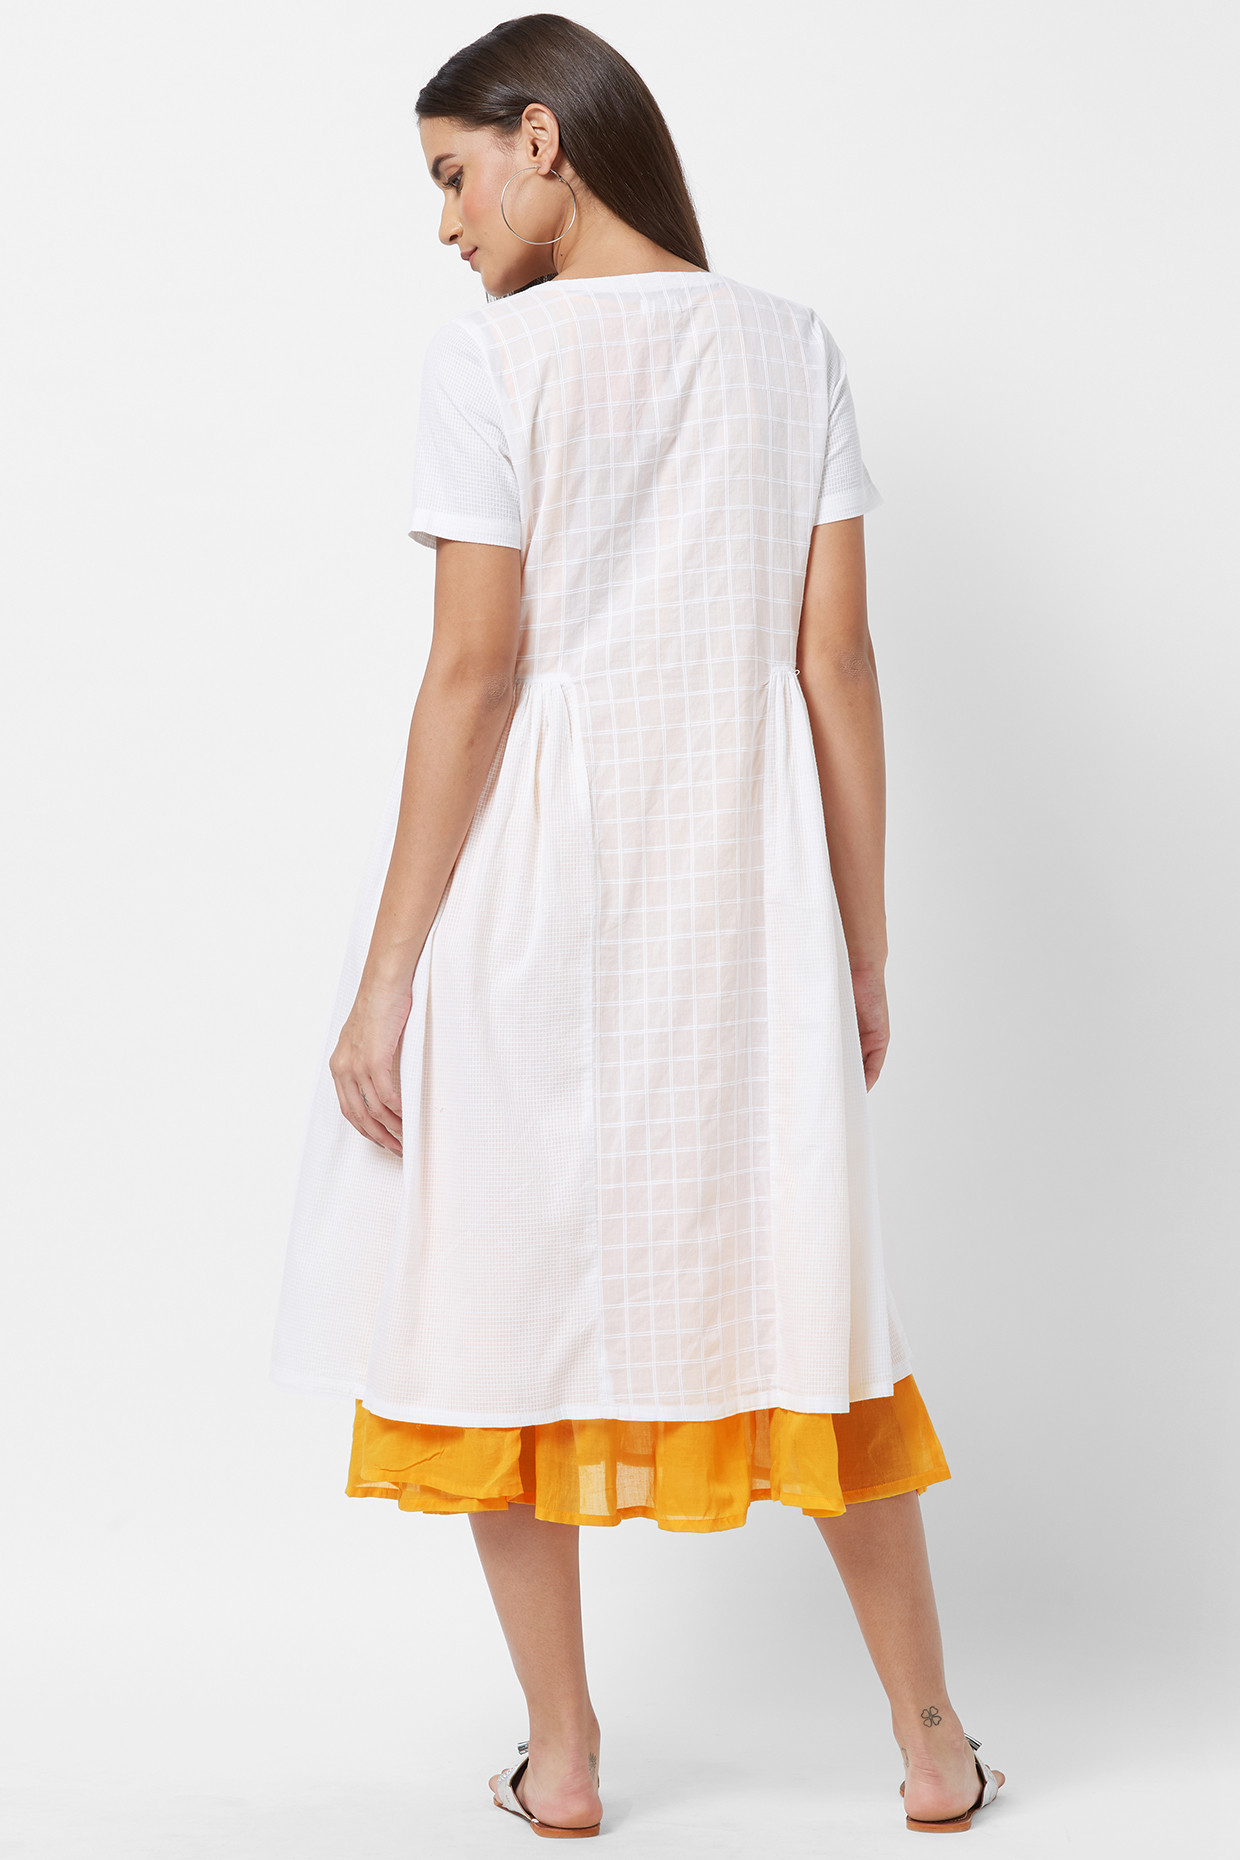 Yellow Slip & White Cotton A-line Kurta by House Of Idar